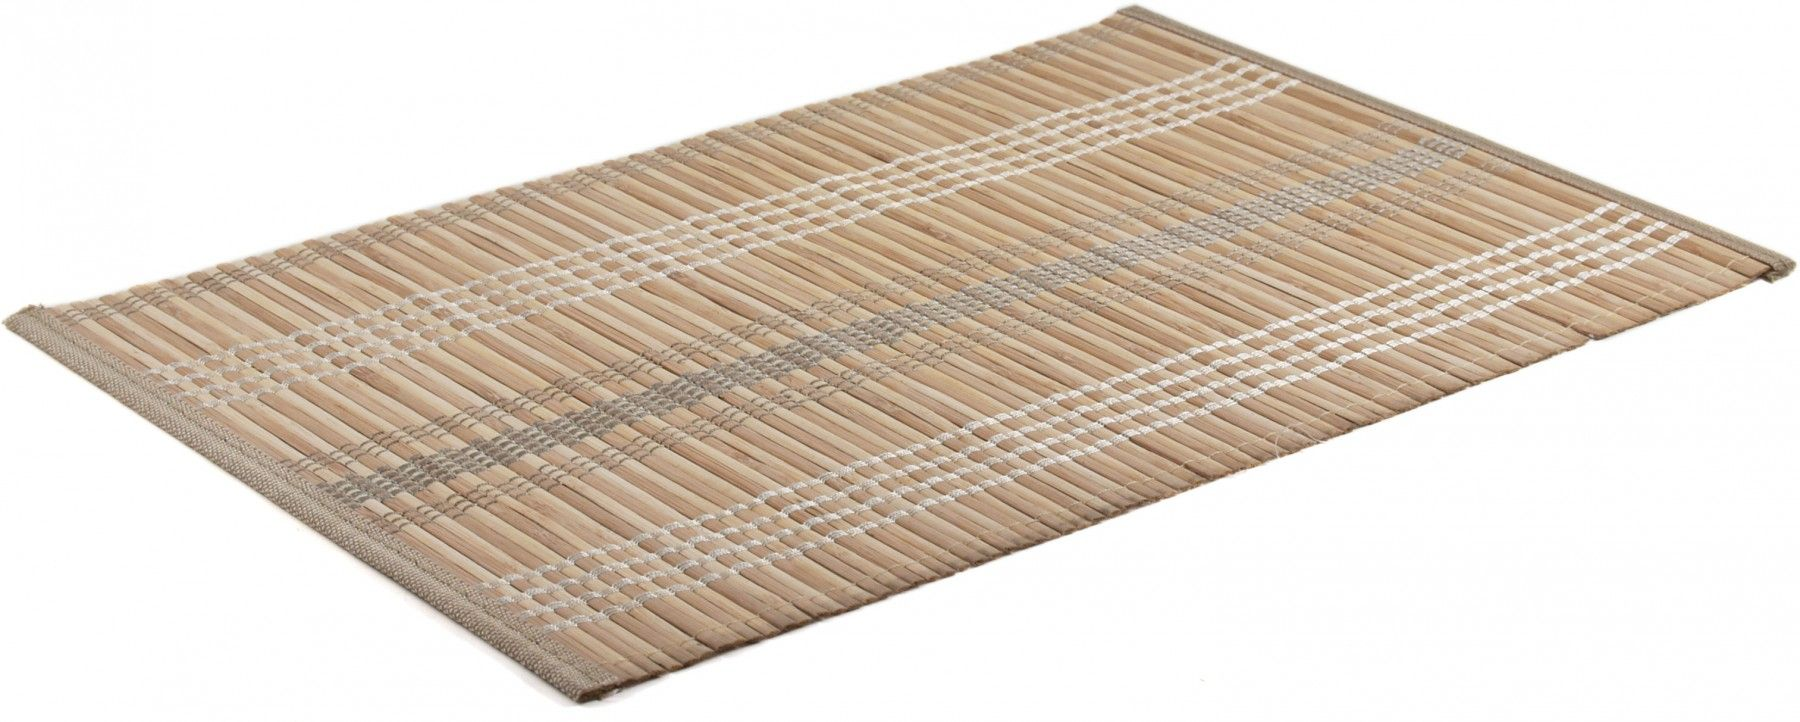 Natural Threaded Bamboo Placemat Set Of 4 Bamboo Placemats Placemats Placemat Sets